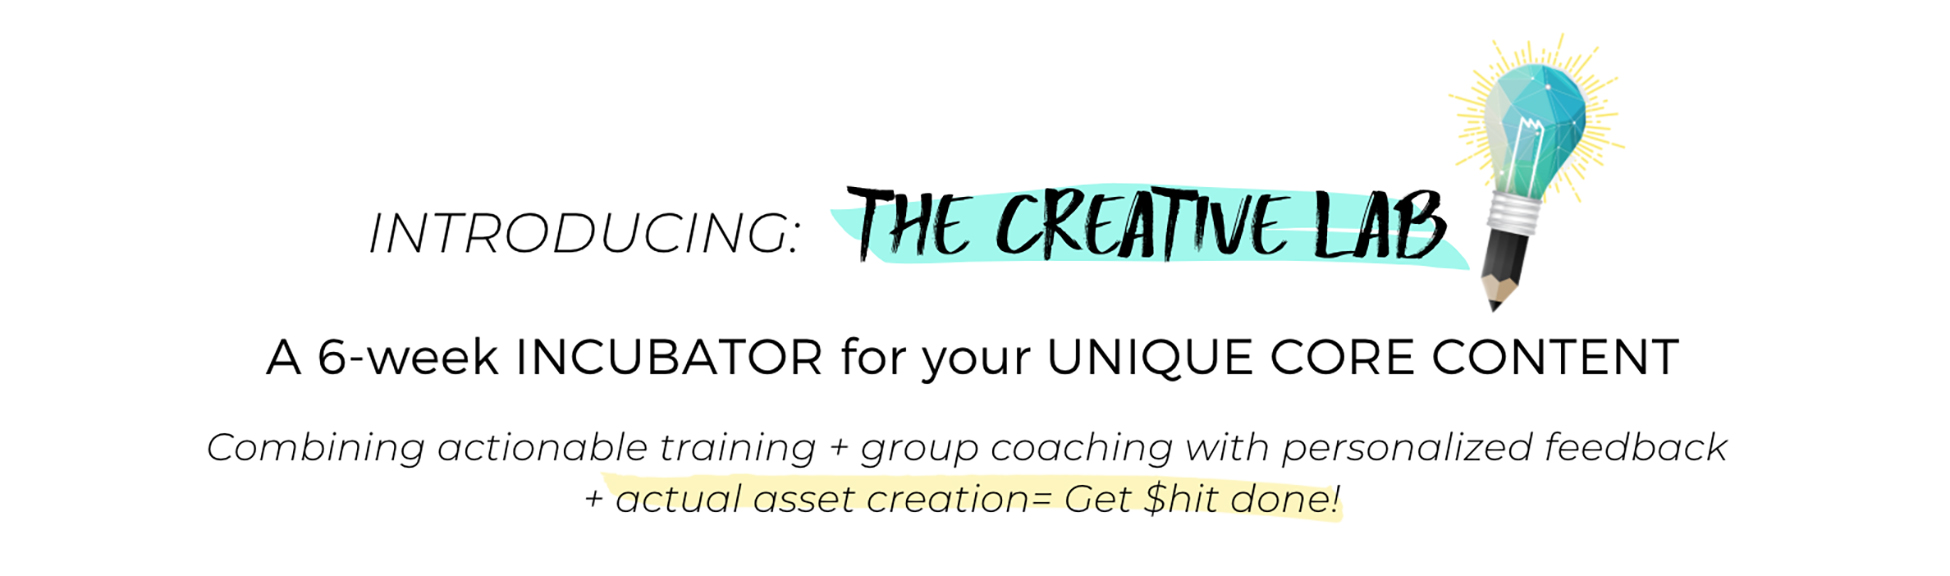 Creative Lab - content incubator - 6 week group coaching program